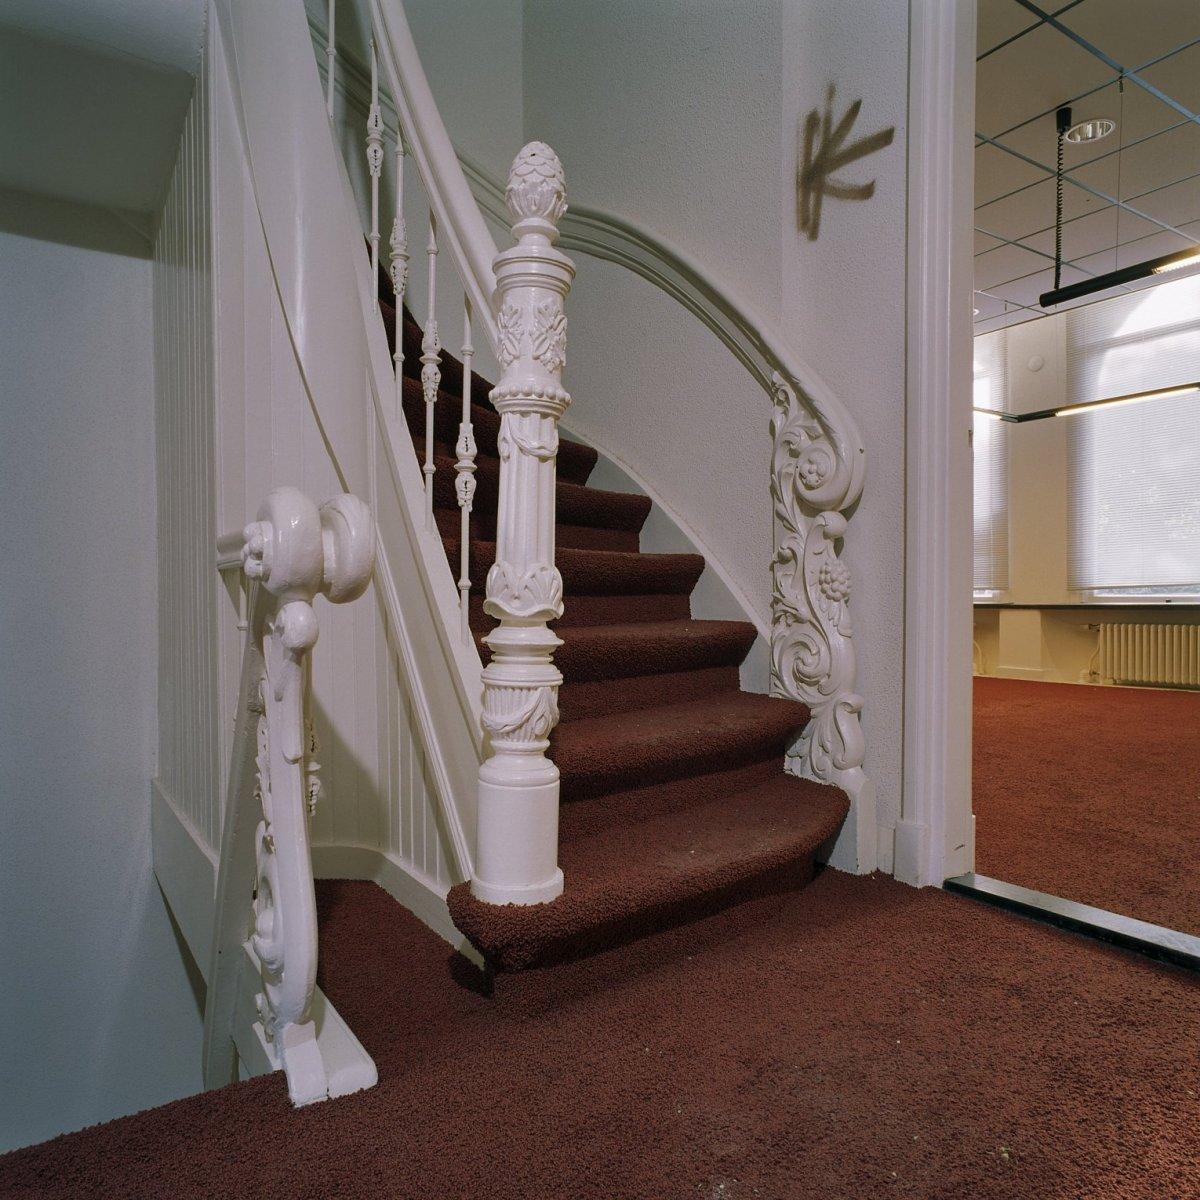 File interieur begane grond hal trap ornamenten van nummer 77 groningen 20359895 - Model interieur trap ...